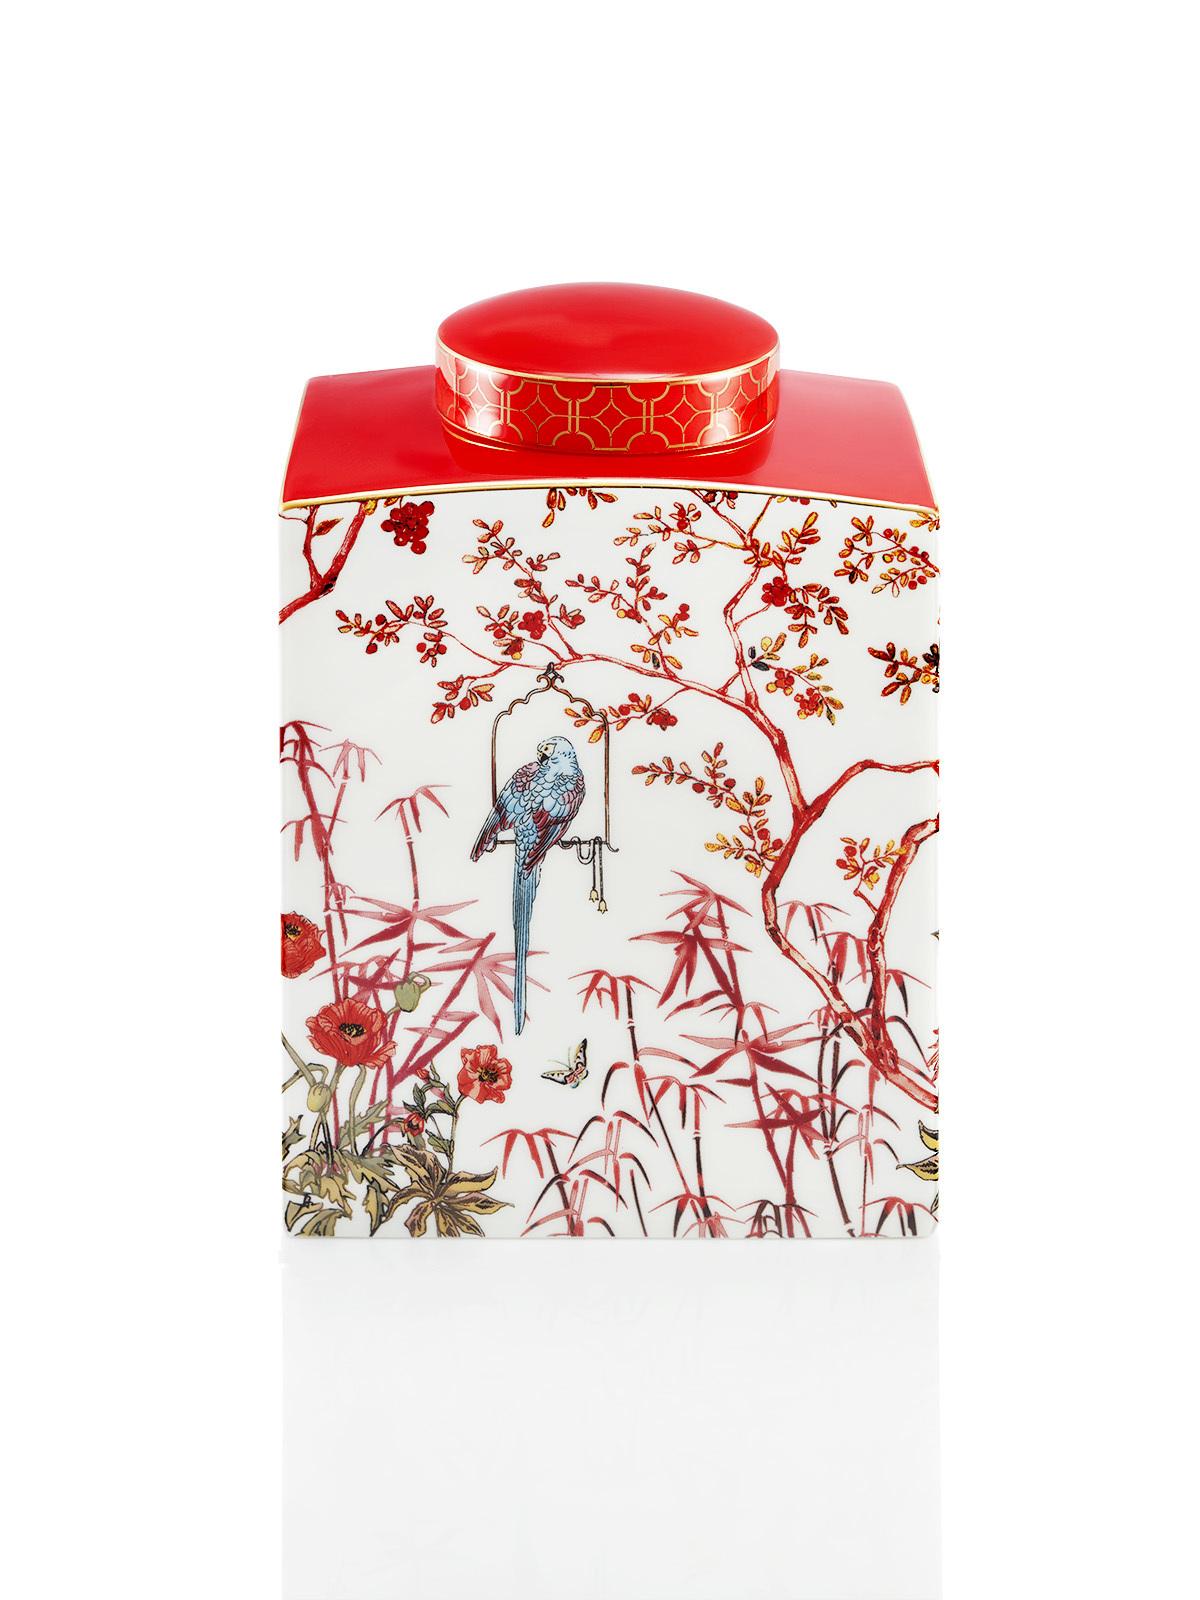 forbidden garden Jar